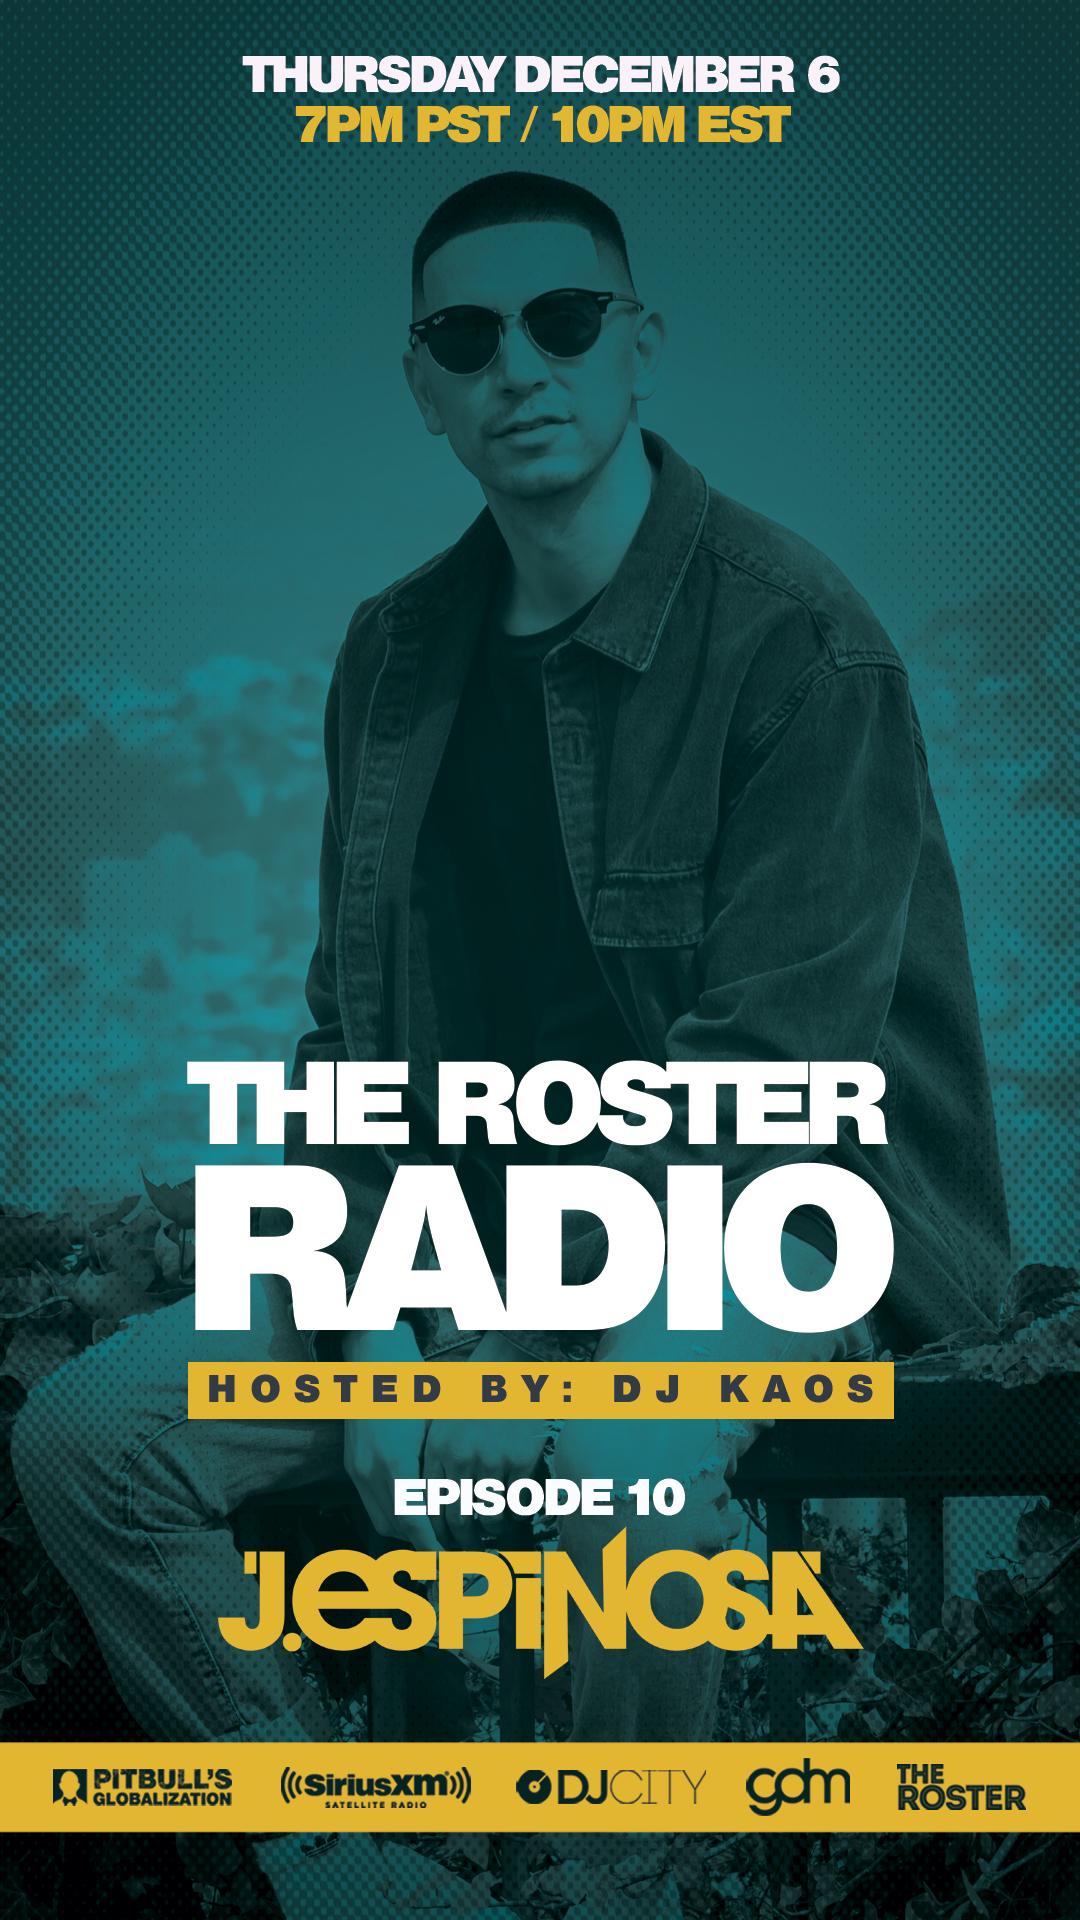 TheRosterRadio-Episode10-Espinosa-Art.jpg